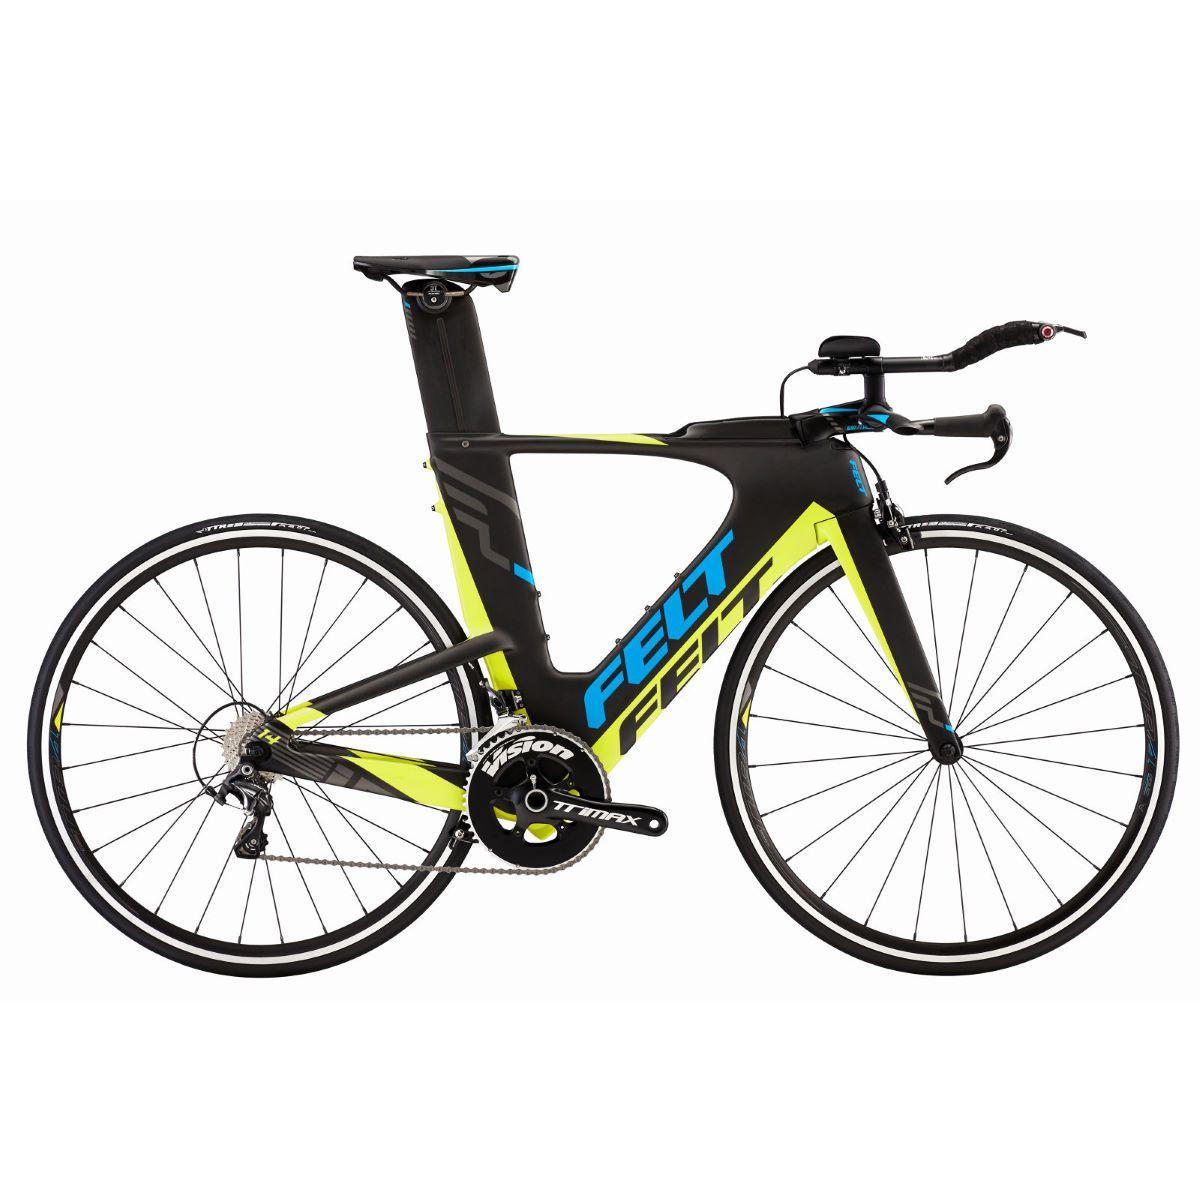 Felt Ia14 2017 Time Trial Bikes Cyclingbargains Dealfinder